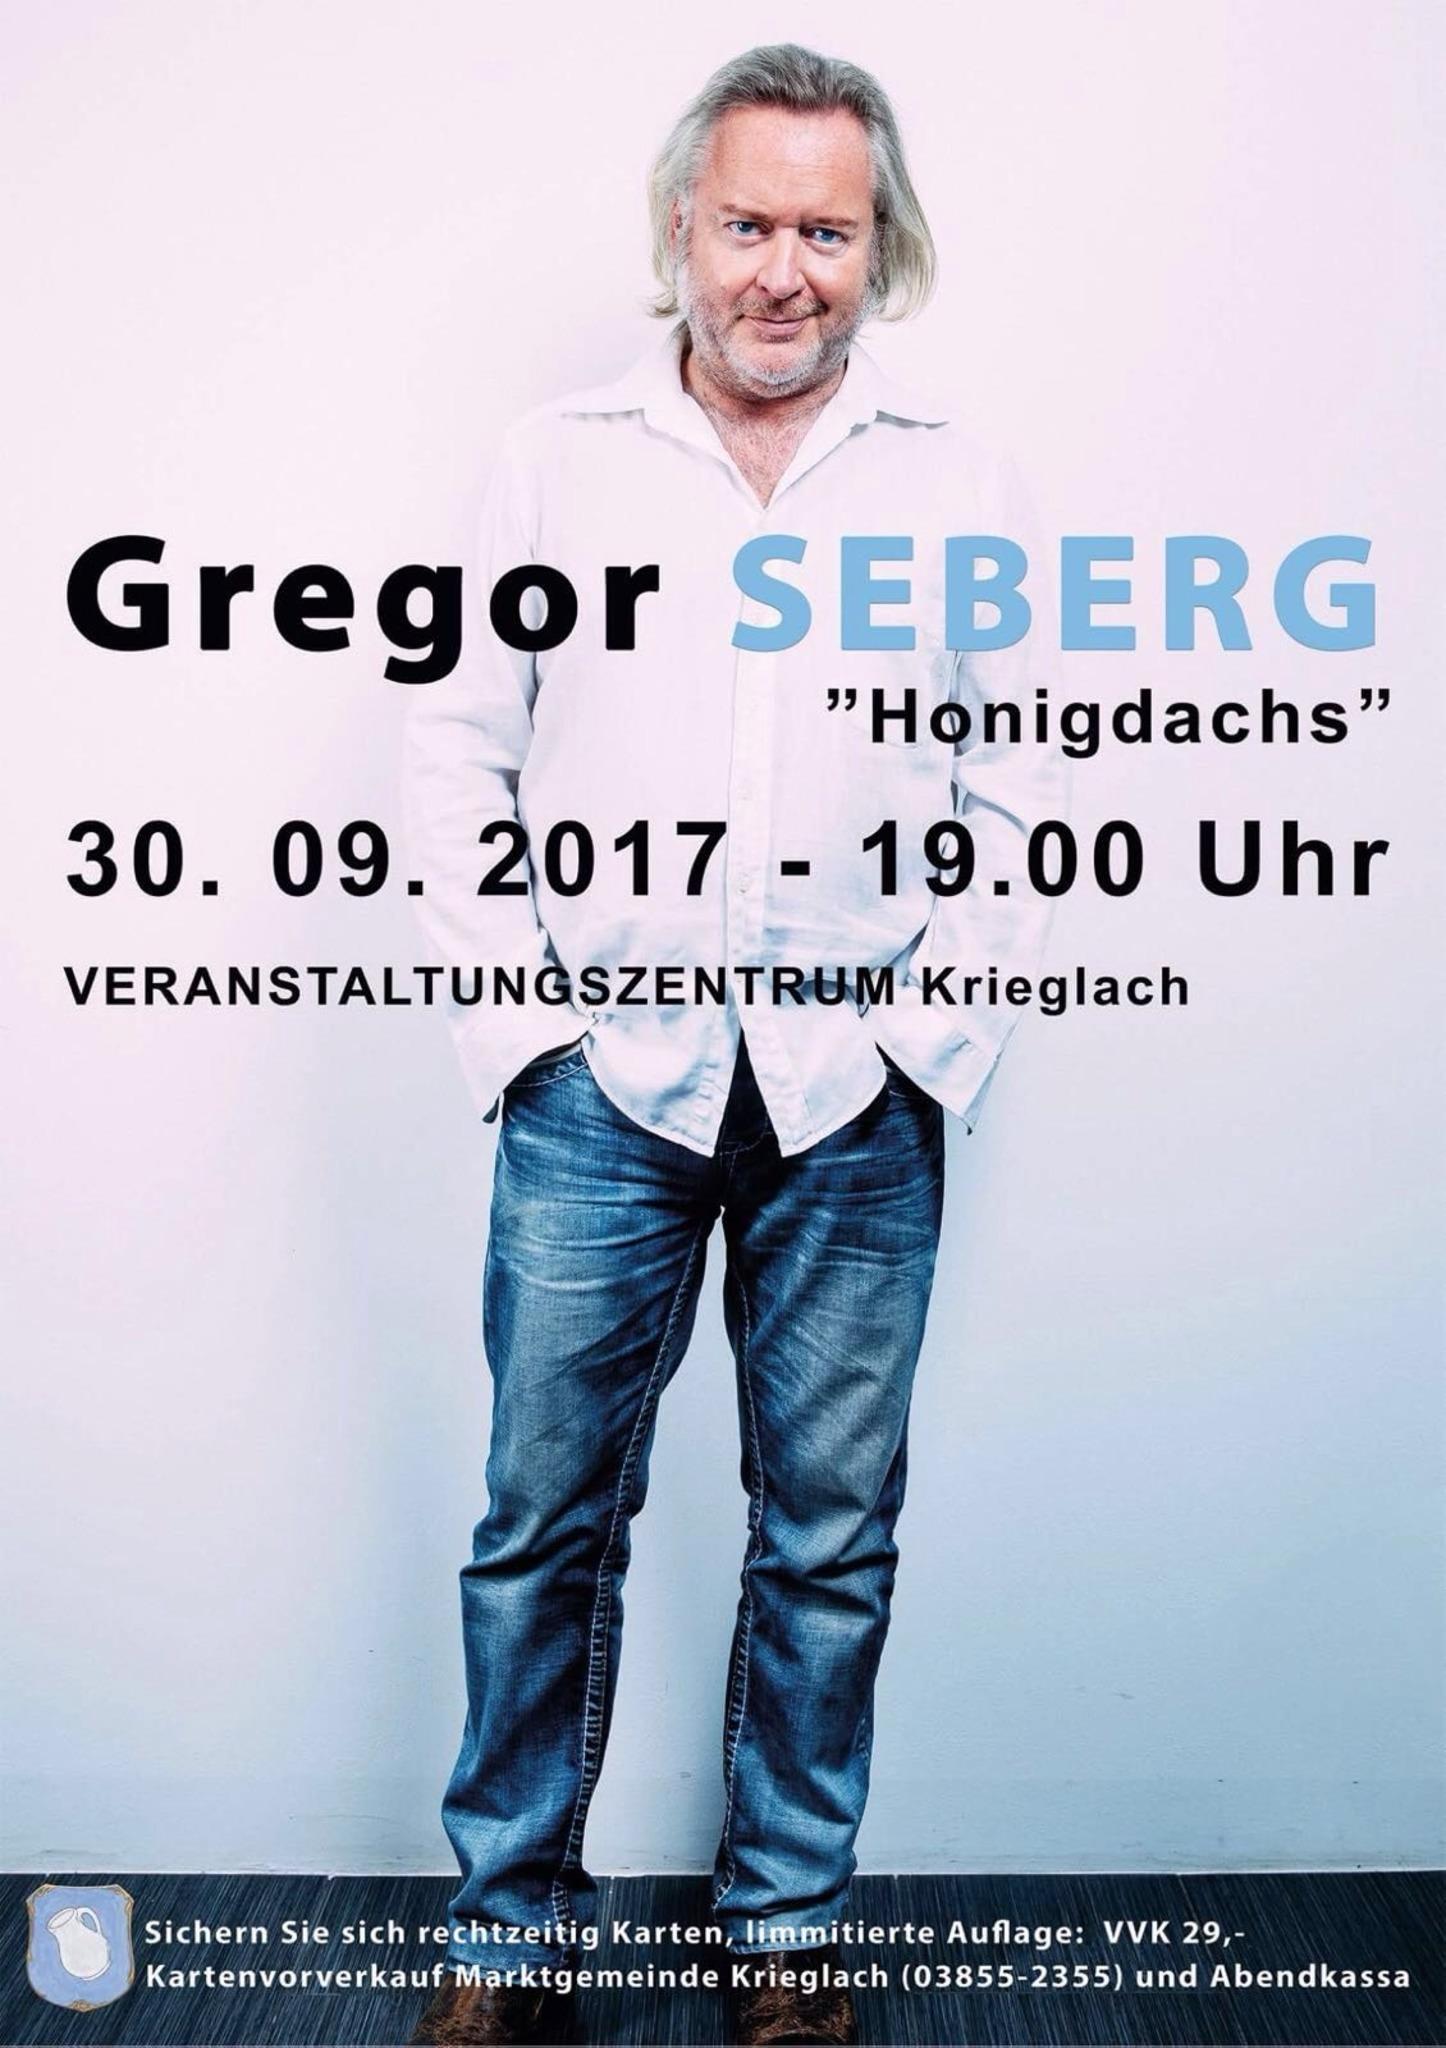 Gregor Seberg Partnerin